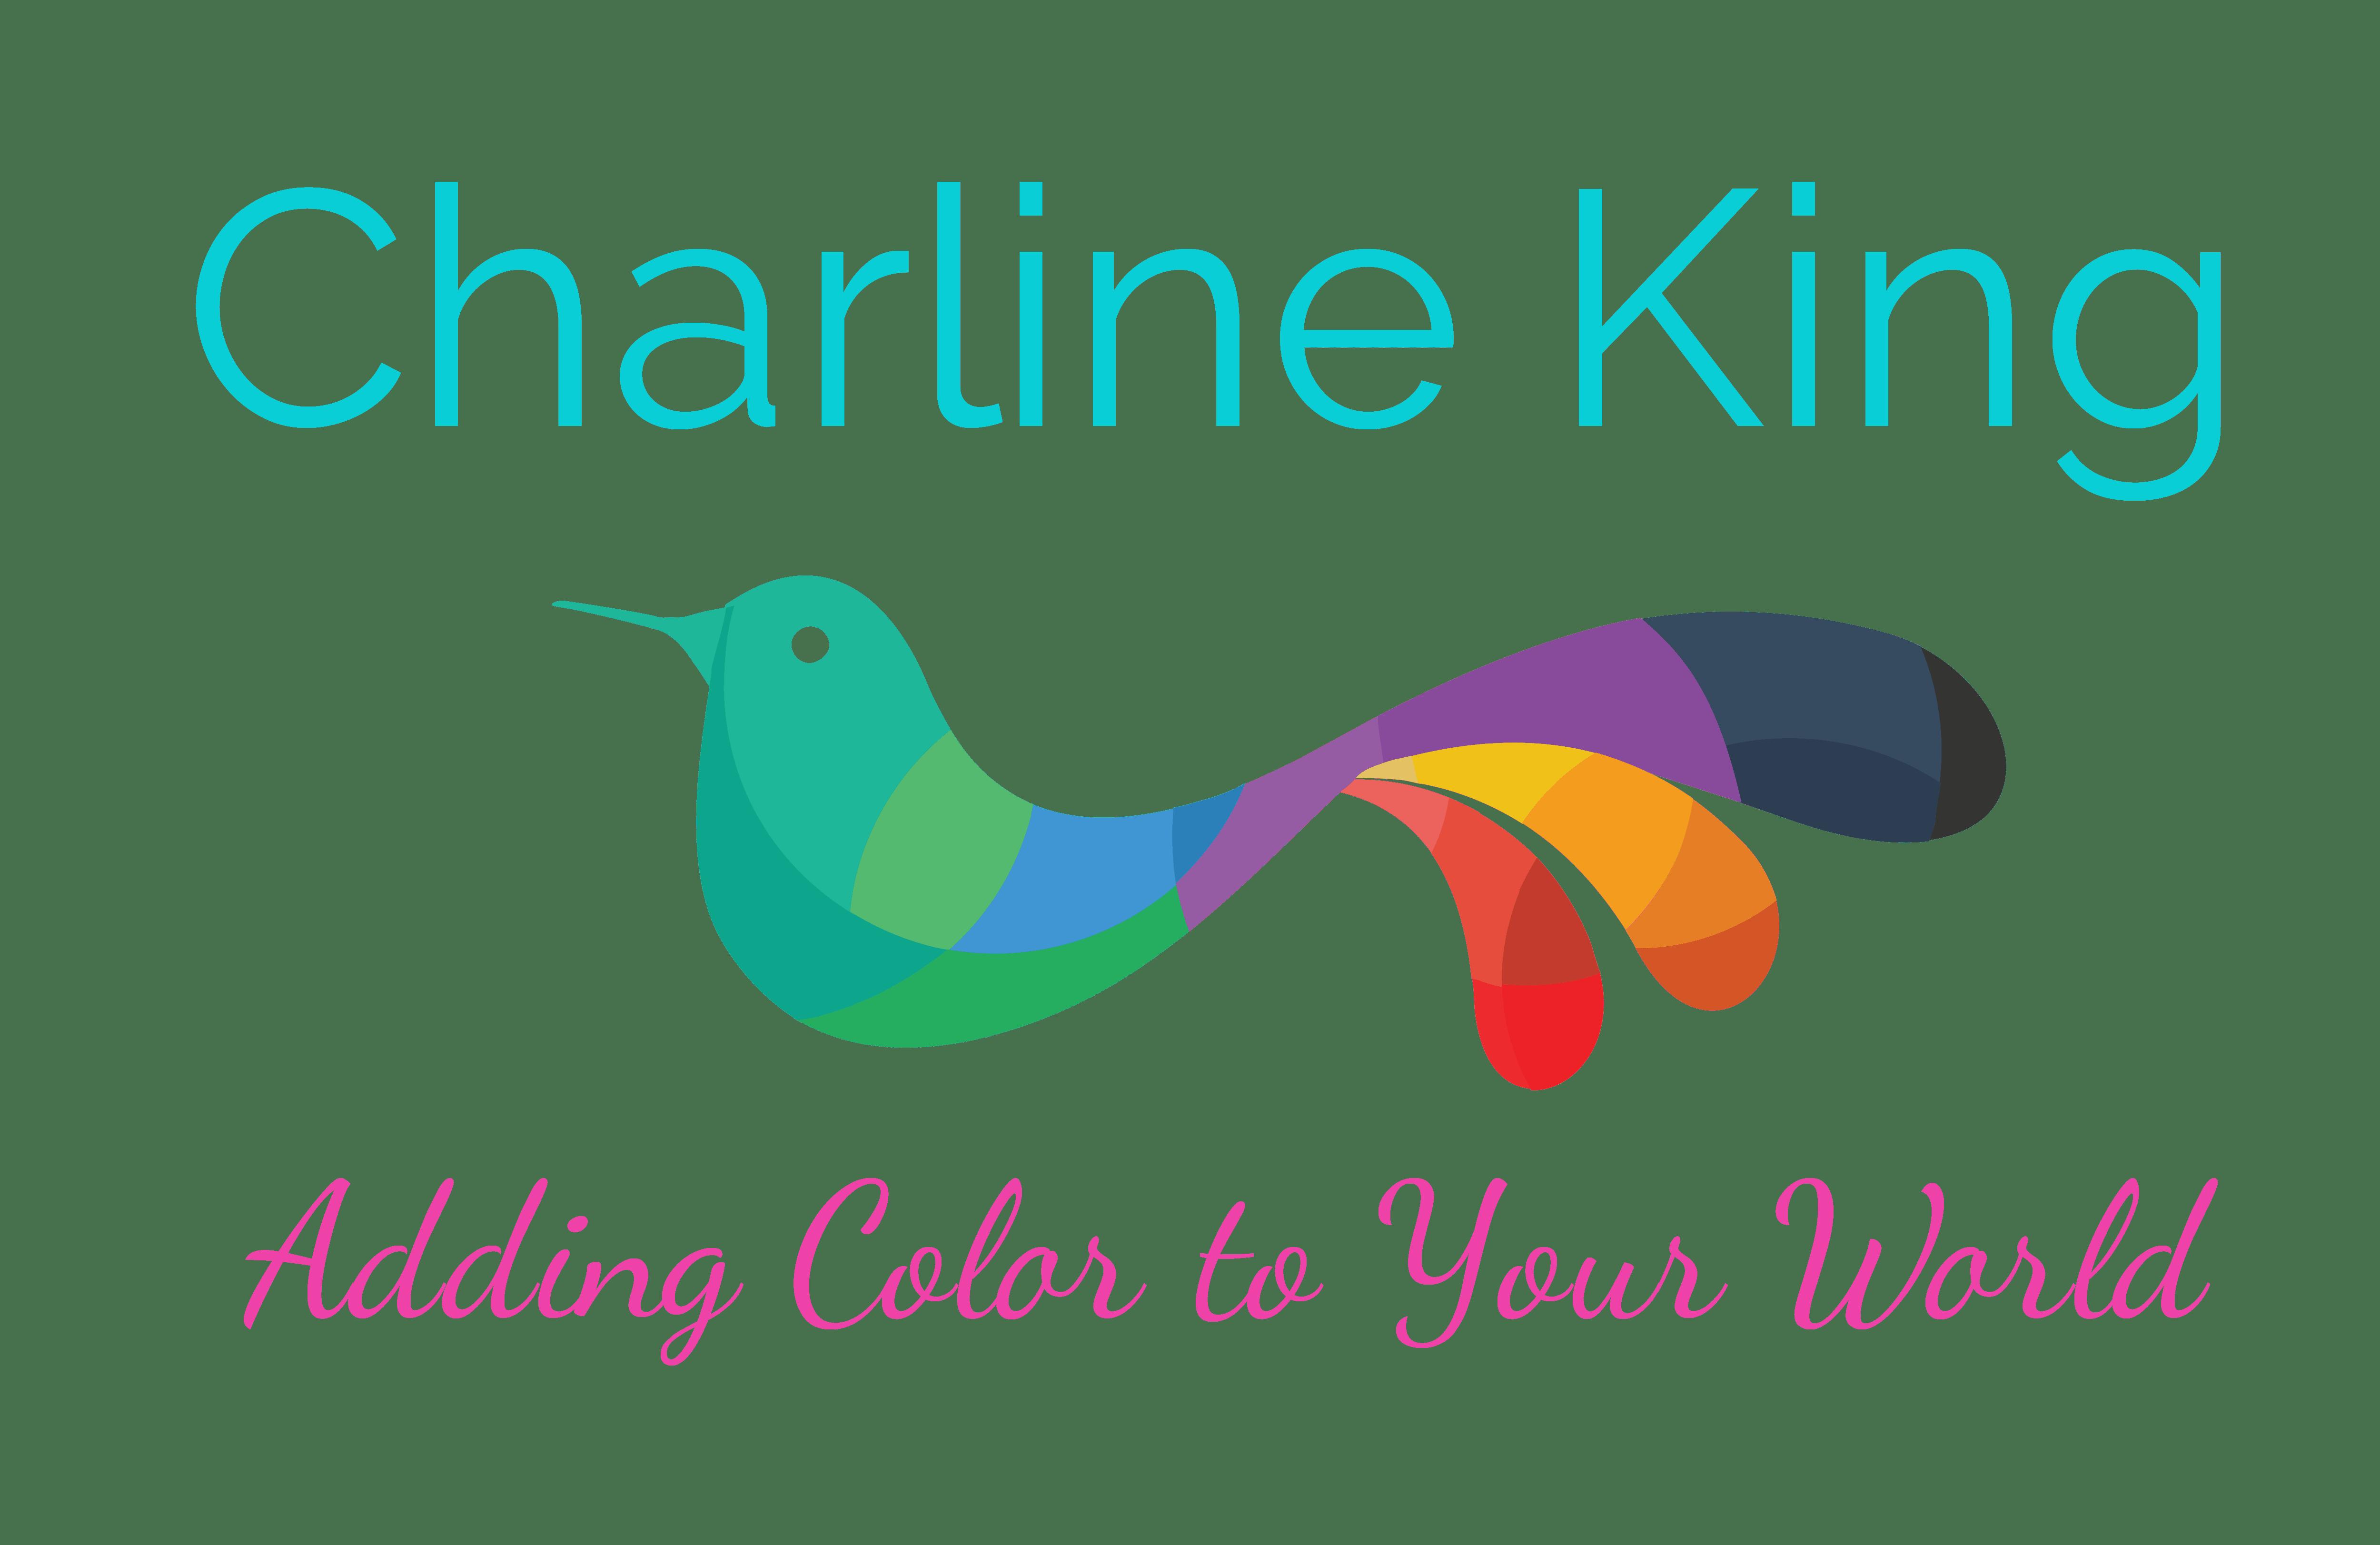 Charline King